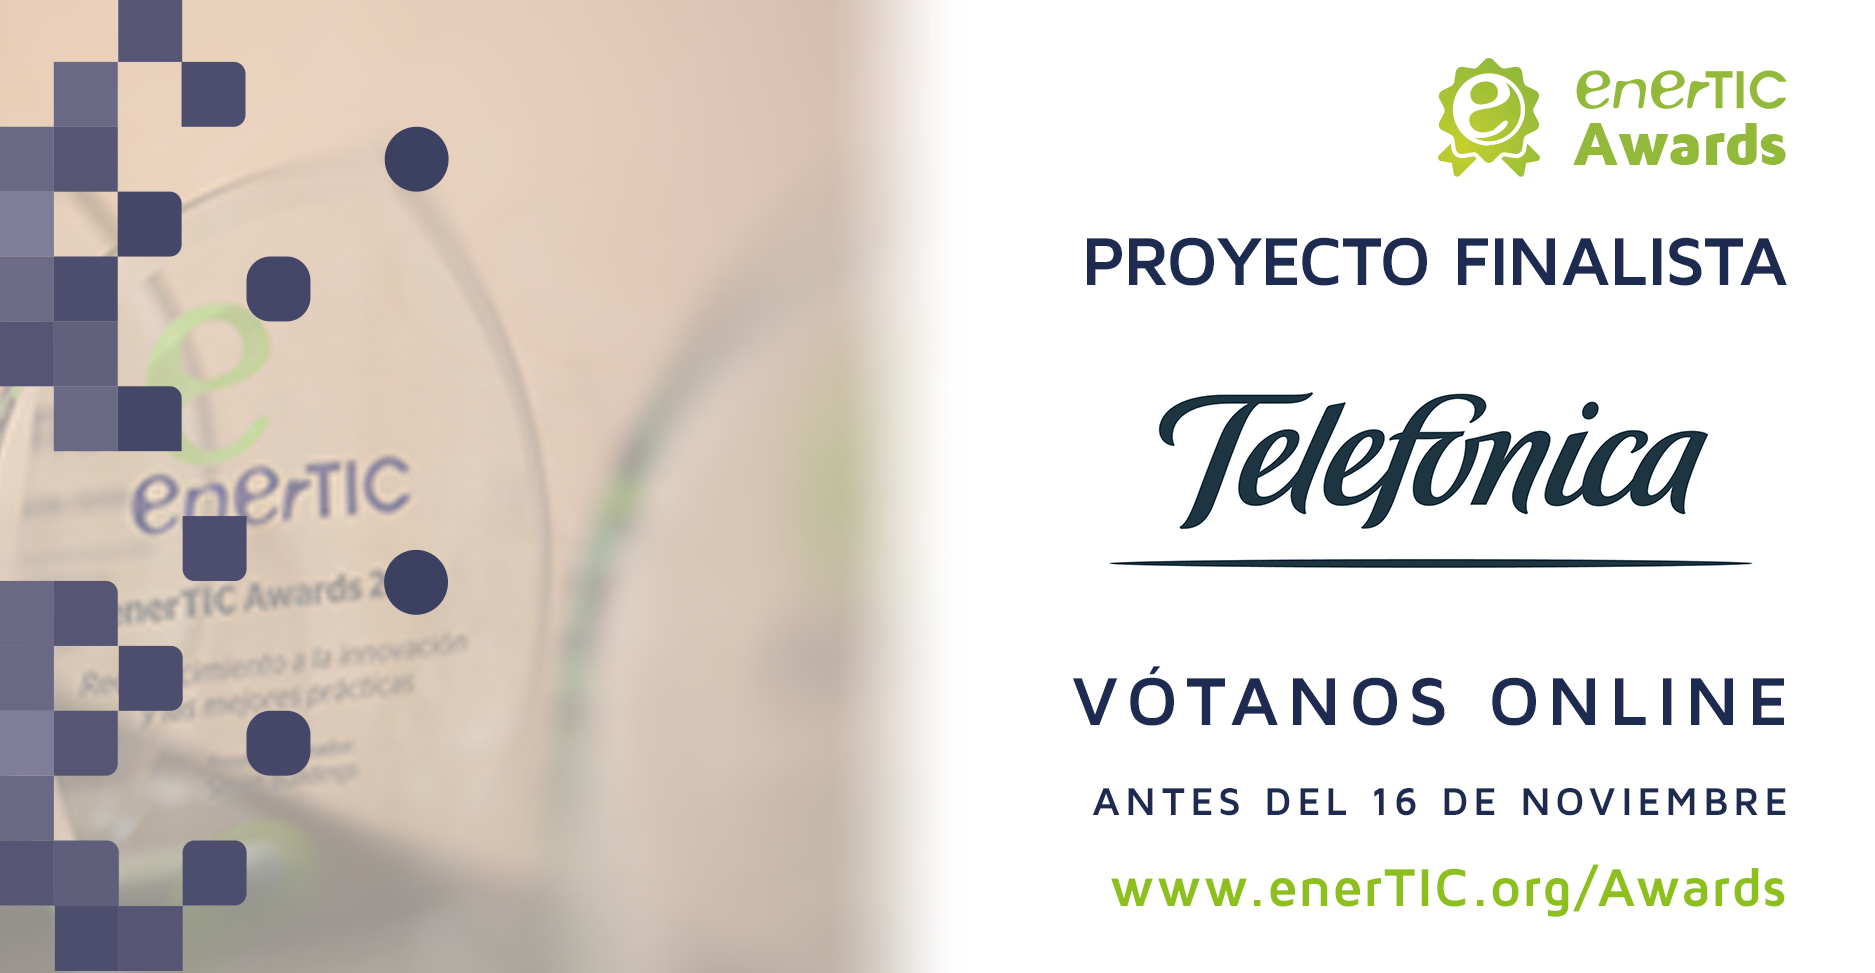 Telefónica Enertic Awards